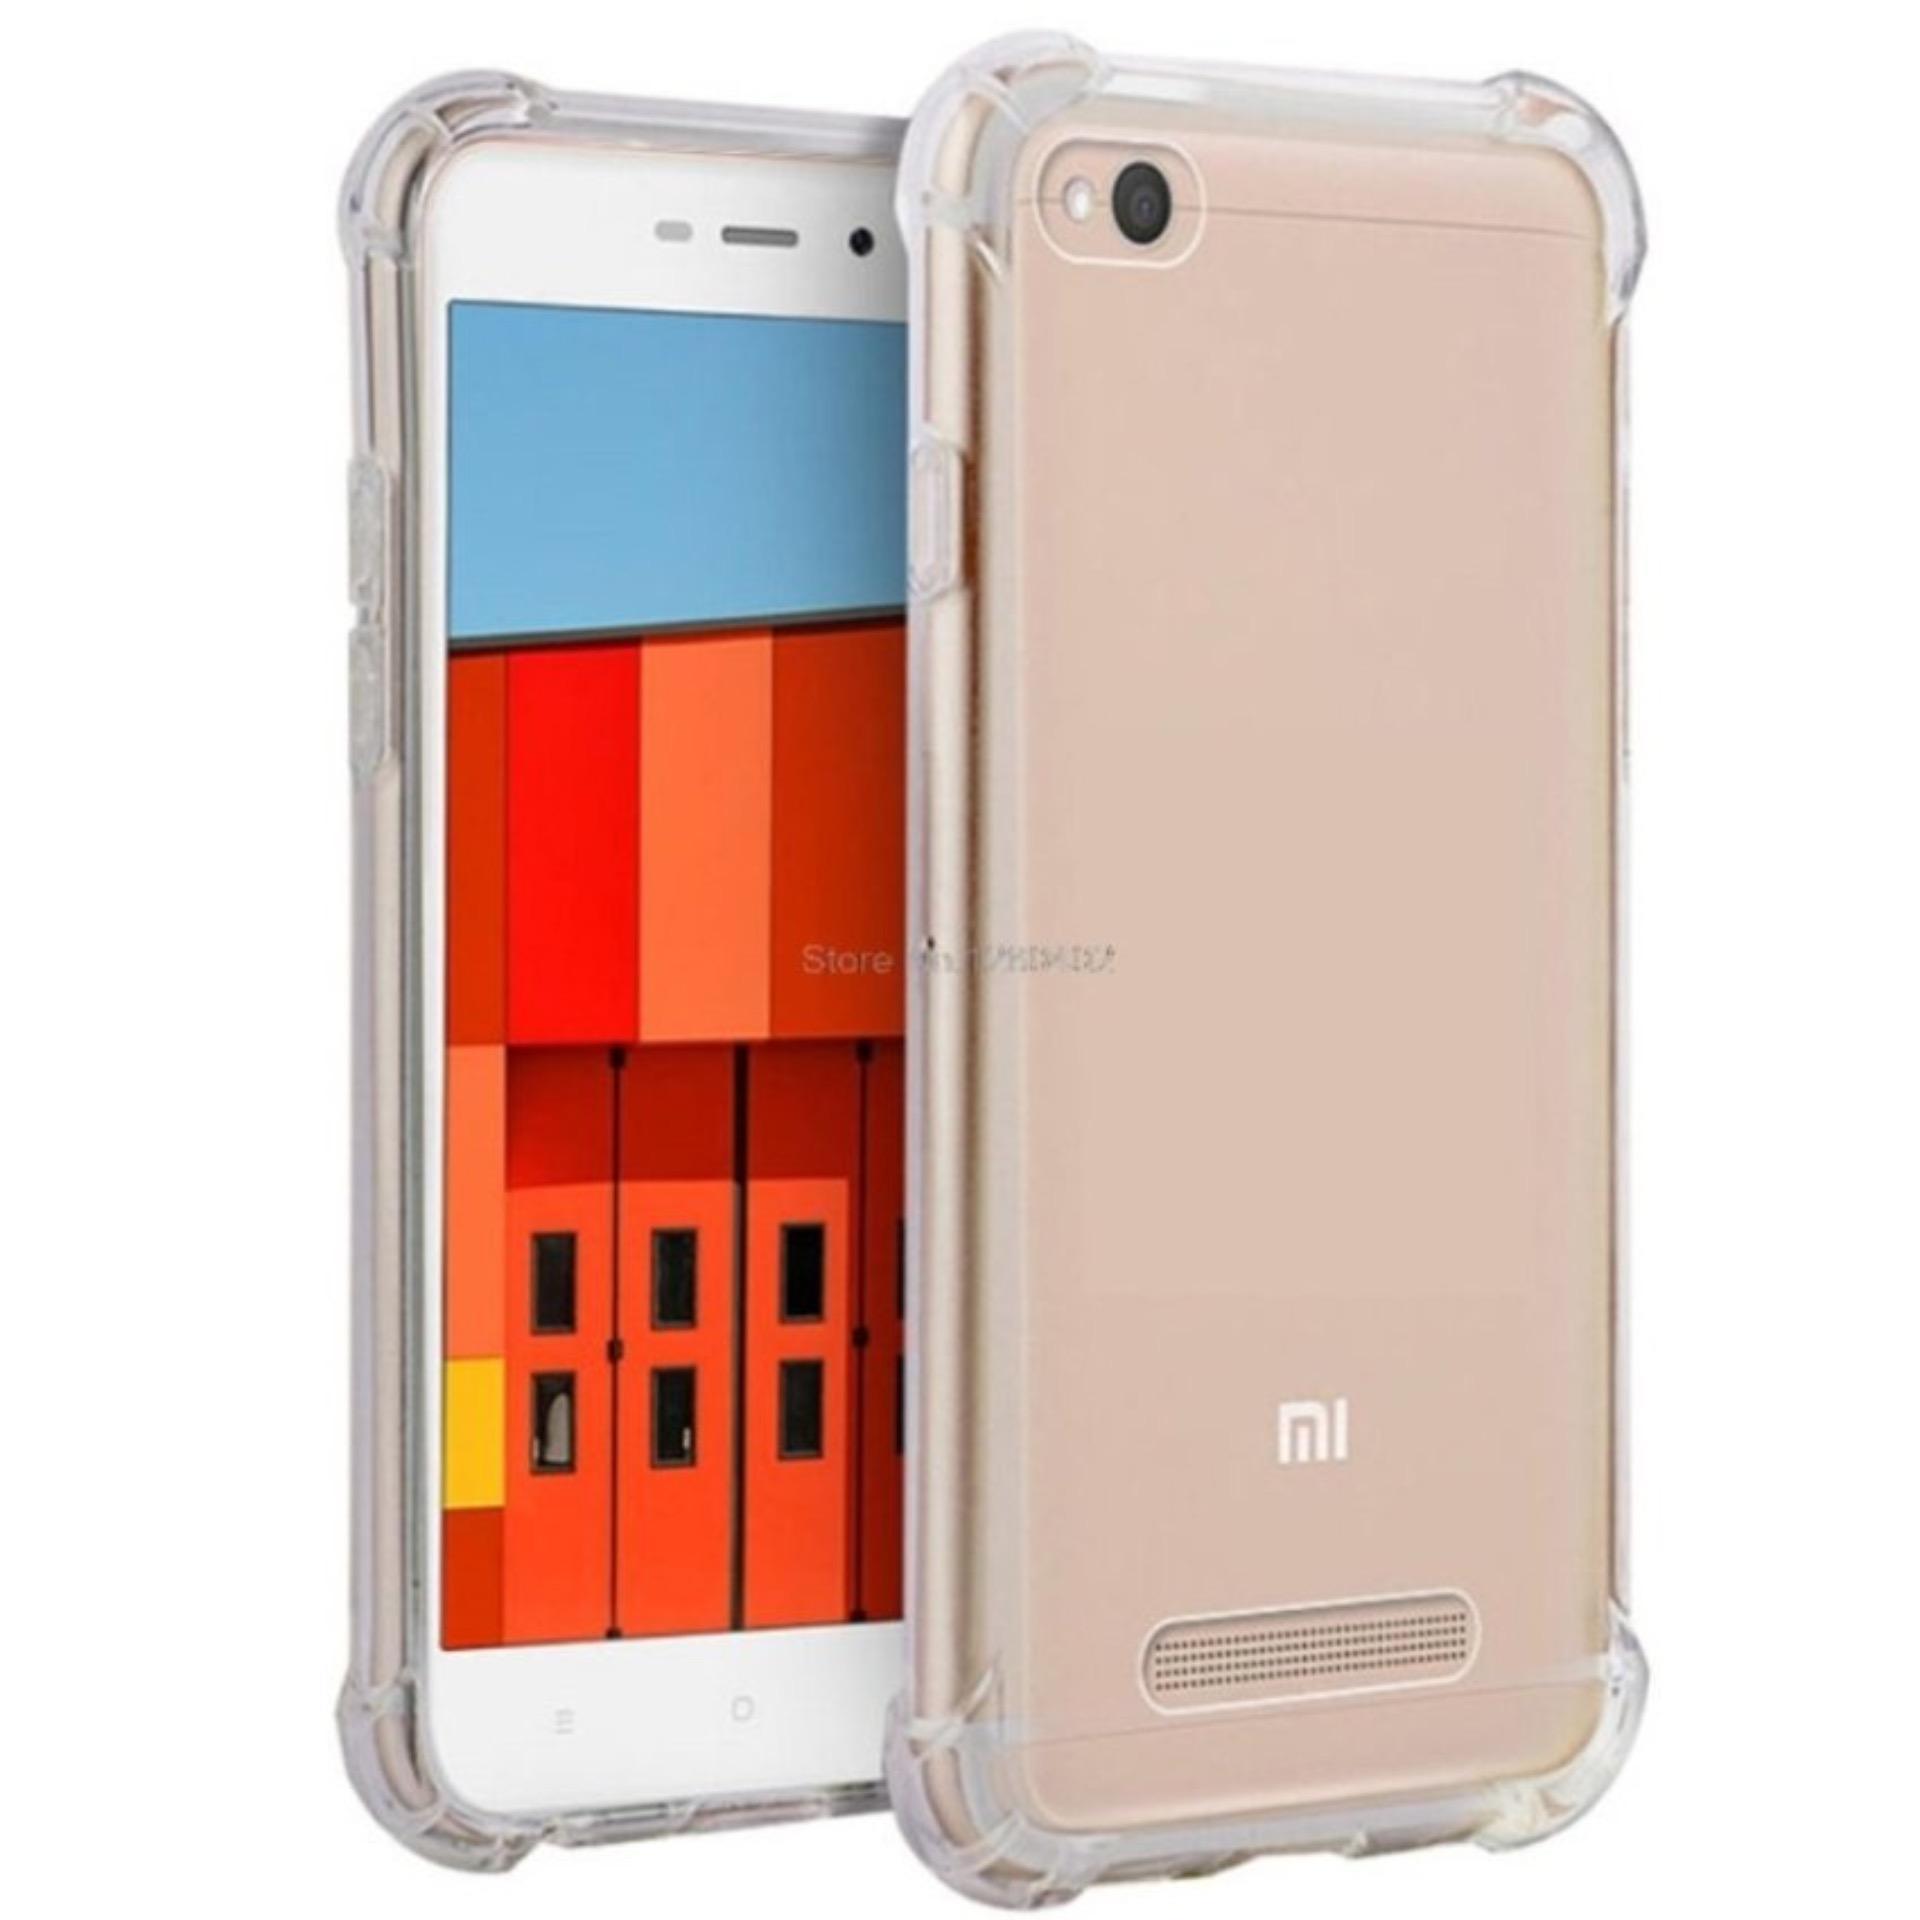 ShockCase for Xioami Xiaomi Xiomi Redmi 4A / Prime (5